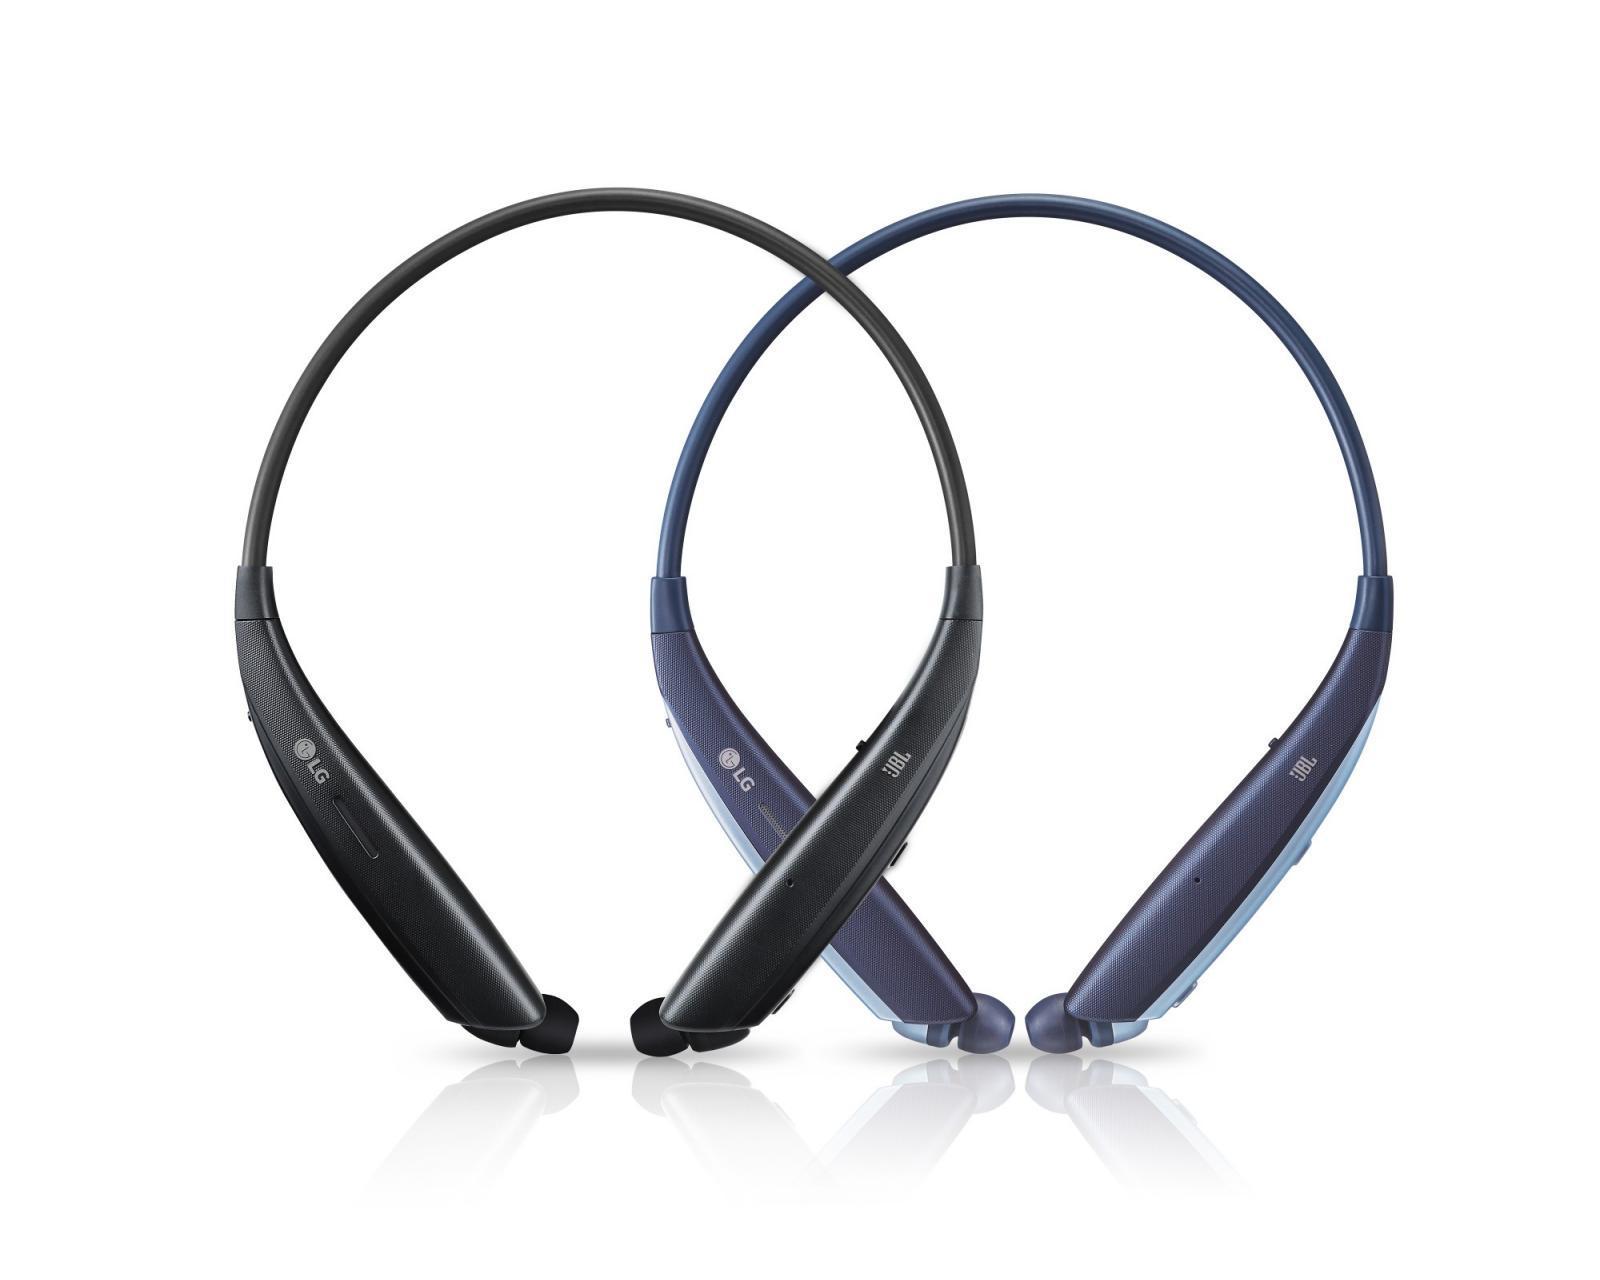 LG TONE Platinum SE brings Google Assistant to headphone